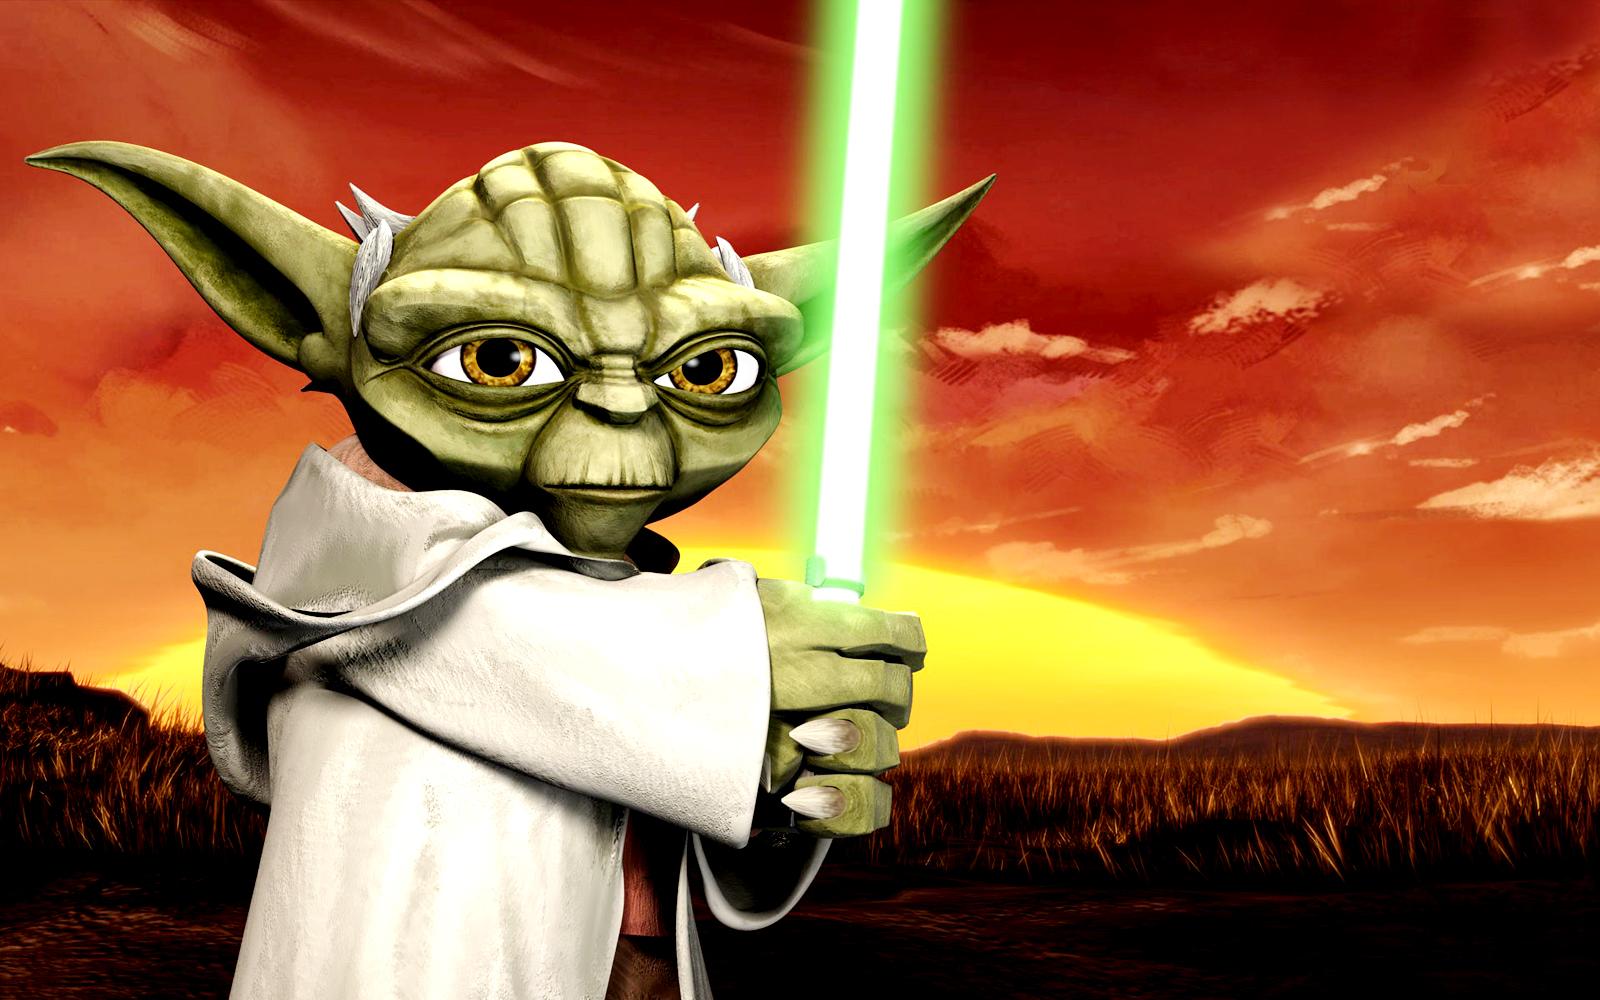 http://4.bp.blogspot.com/-ozKDxX34We0/TrWGsvc3xCI/AAAAAAAAEMw/1I0uS-B0AG4/s1600/Jedi_Master_Yoda_Wallpaper_Vvallpaper.Net.jpg